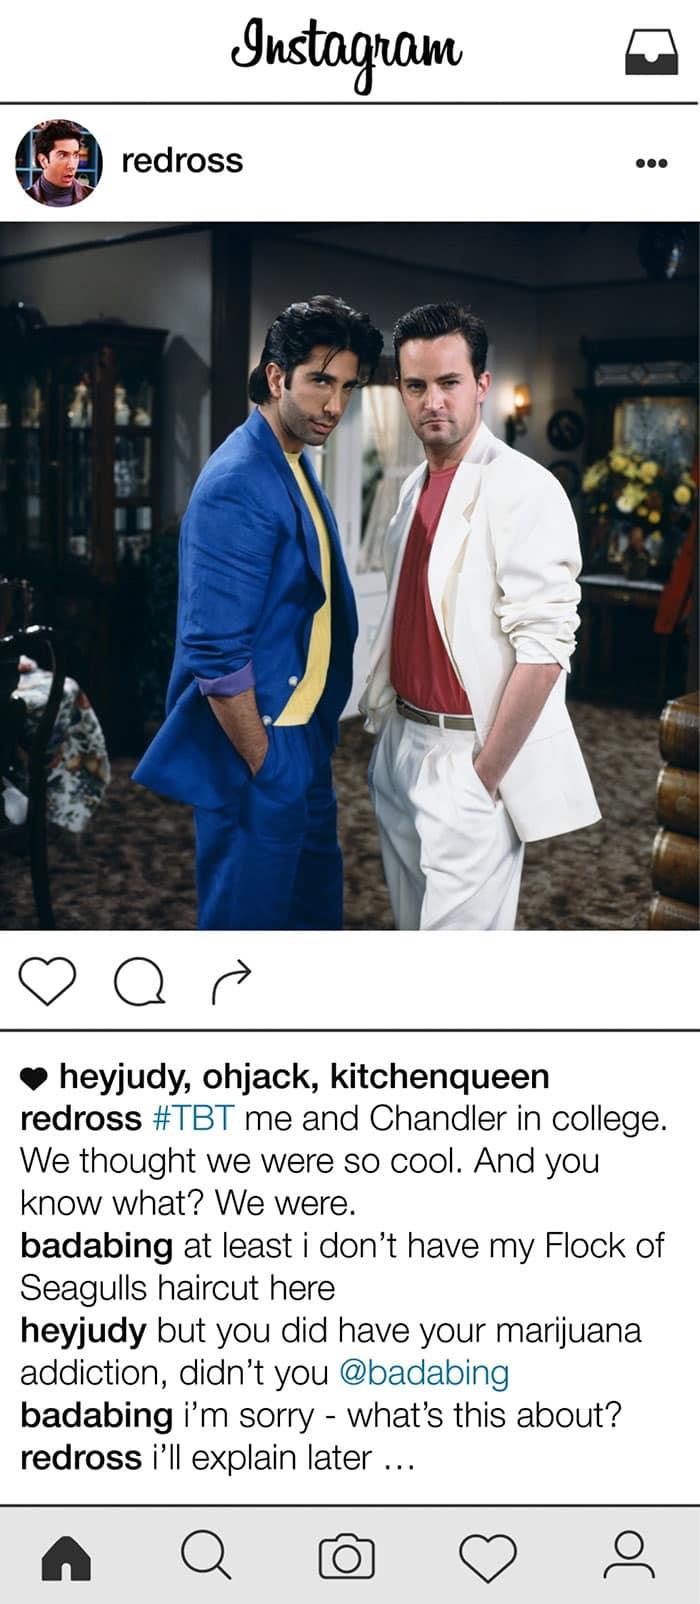 friends-ross-geller-instagram-80s-ross-chandler